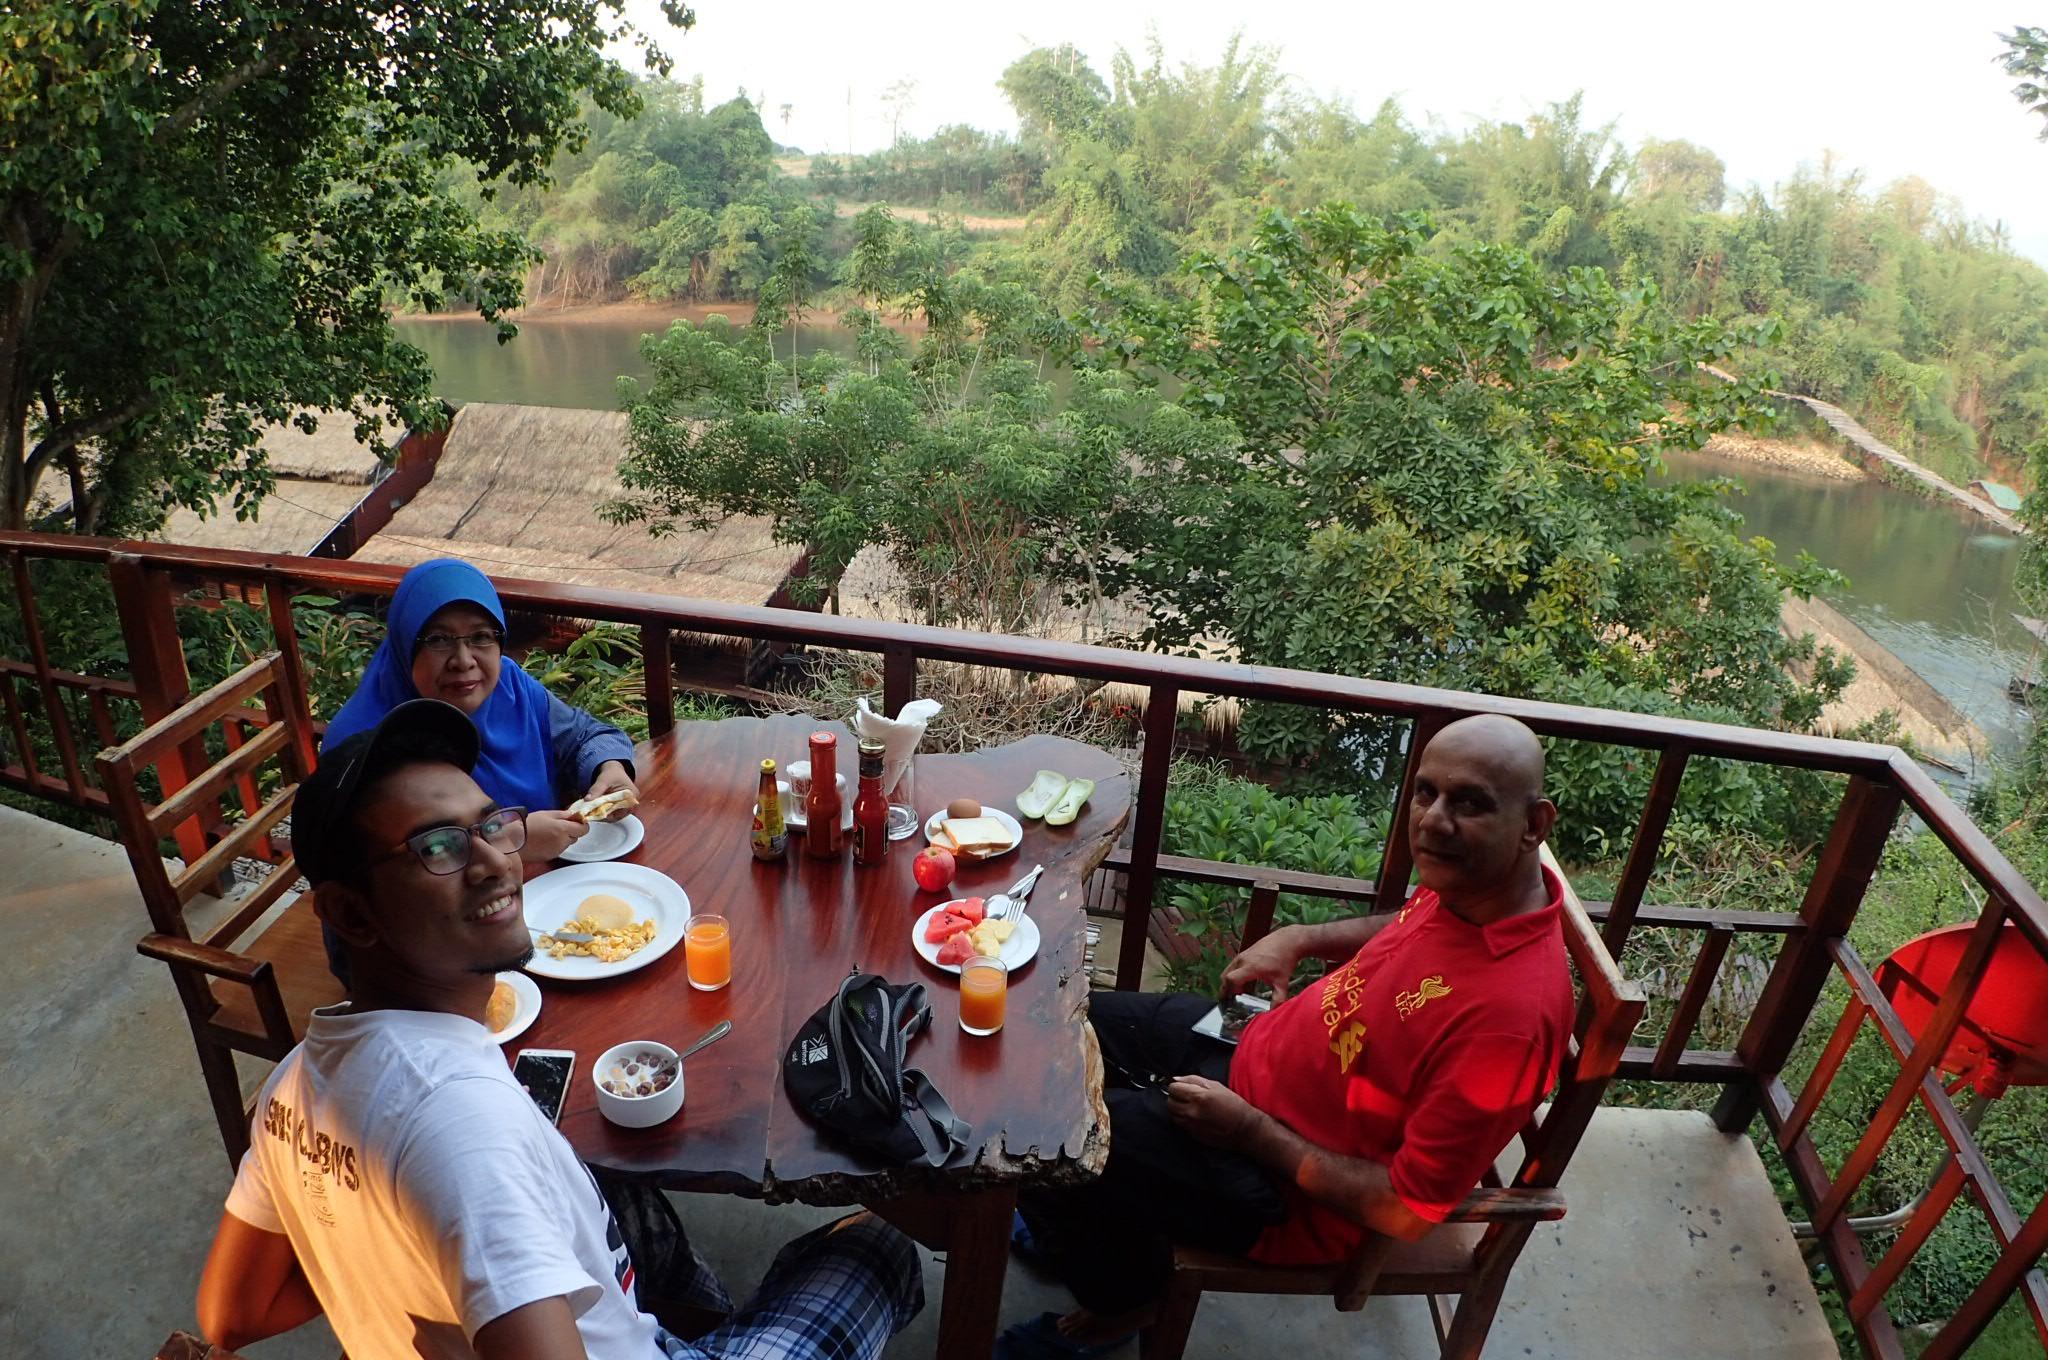 Breakfast with a view katanya. Nasib baik hotel ni sediakan nasi goreng sayur dan telur. Boleh makan sampai kenyang.